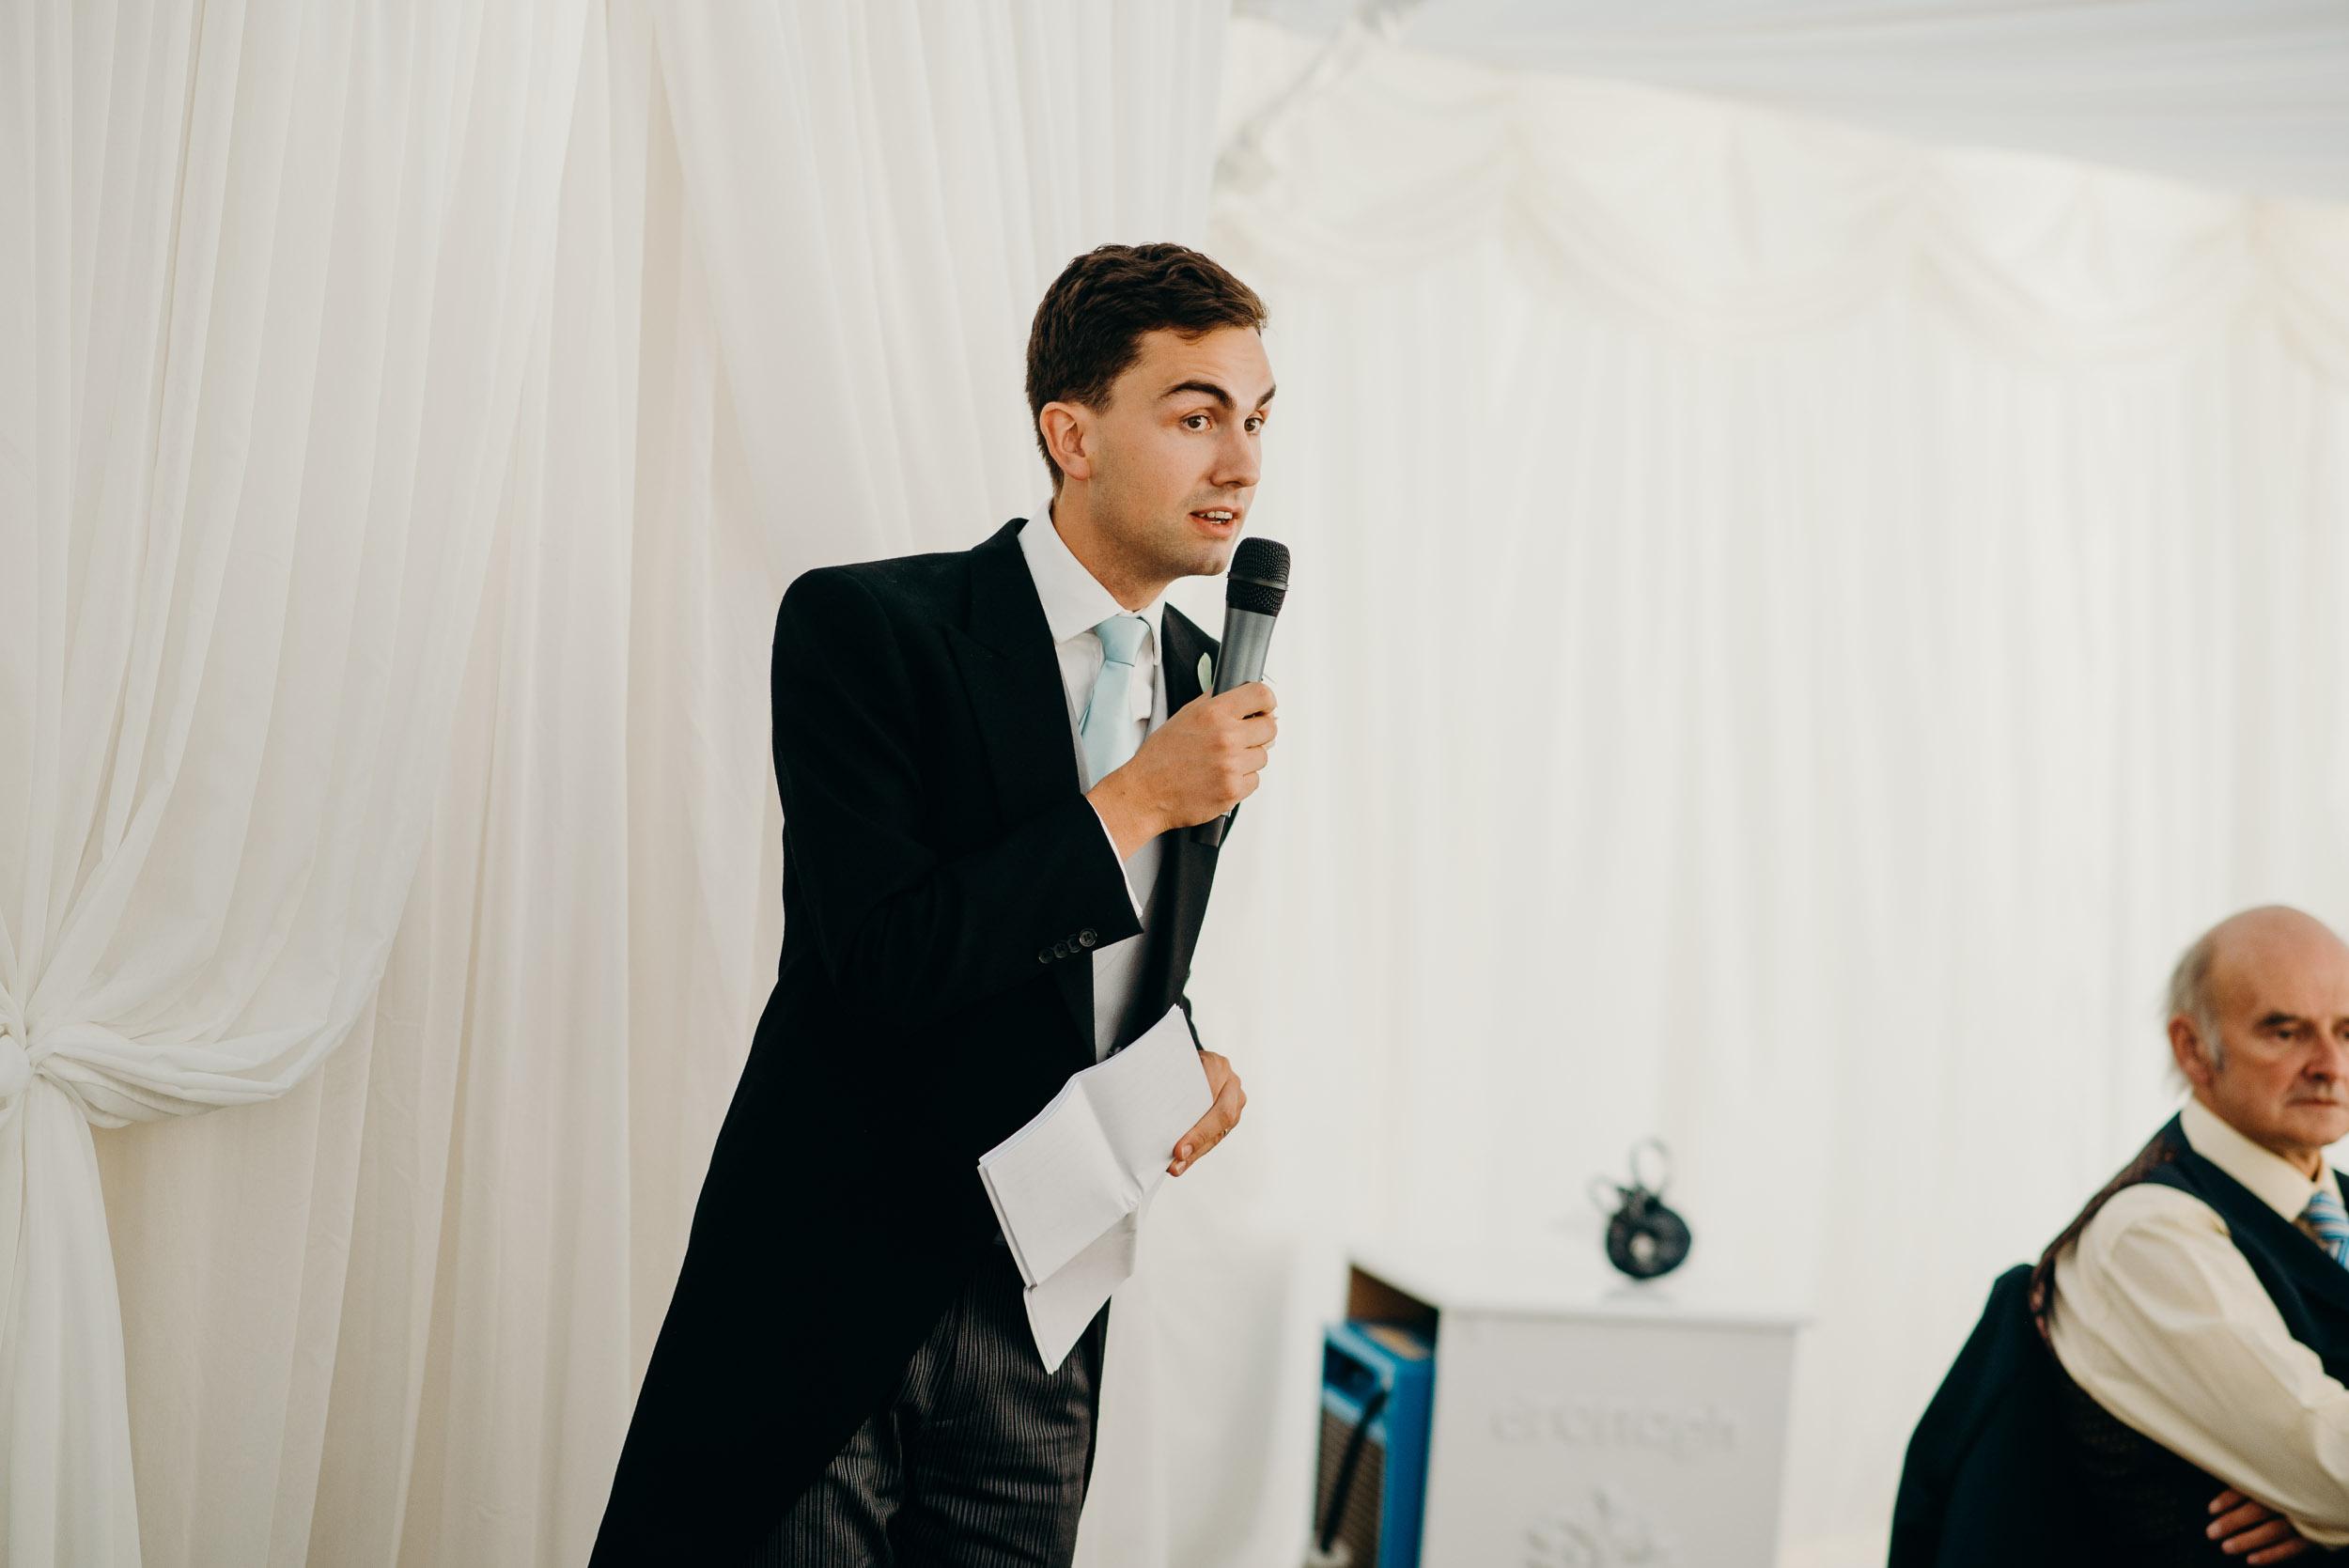 drenagh estate wedding photography-109.jpg